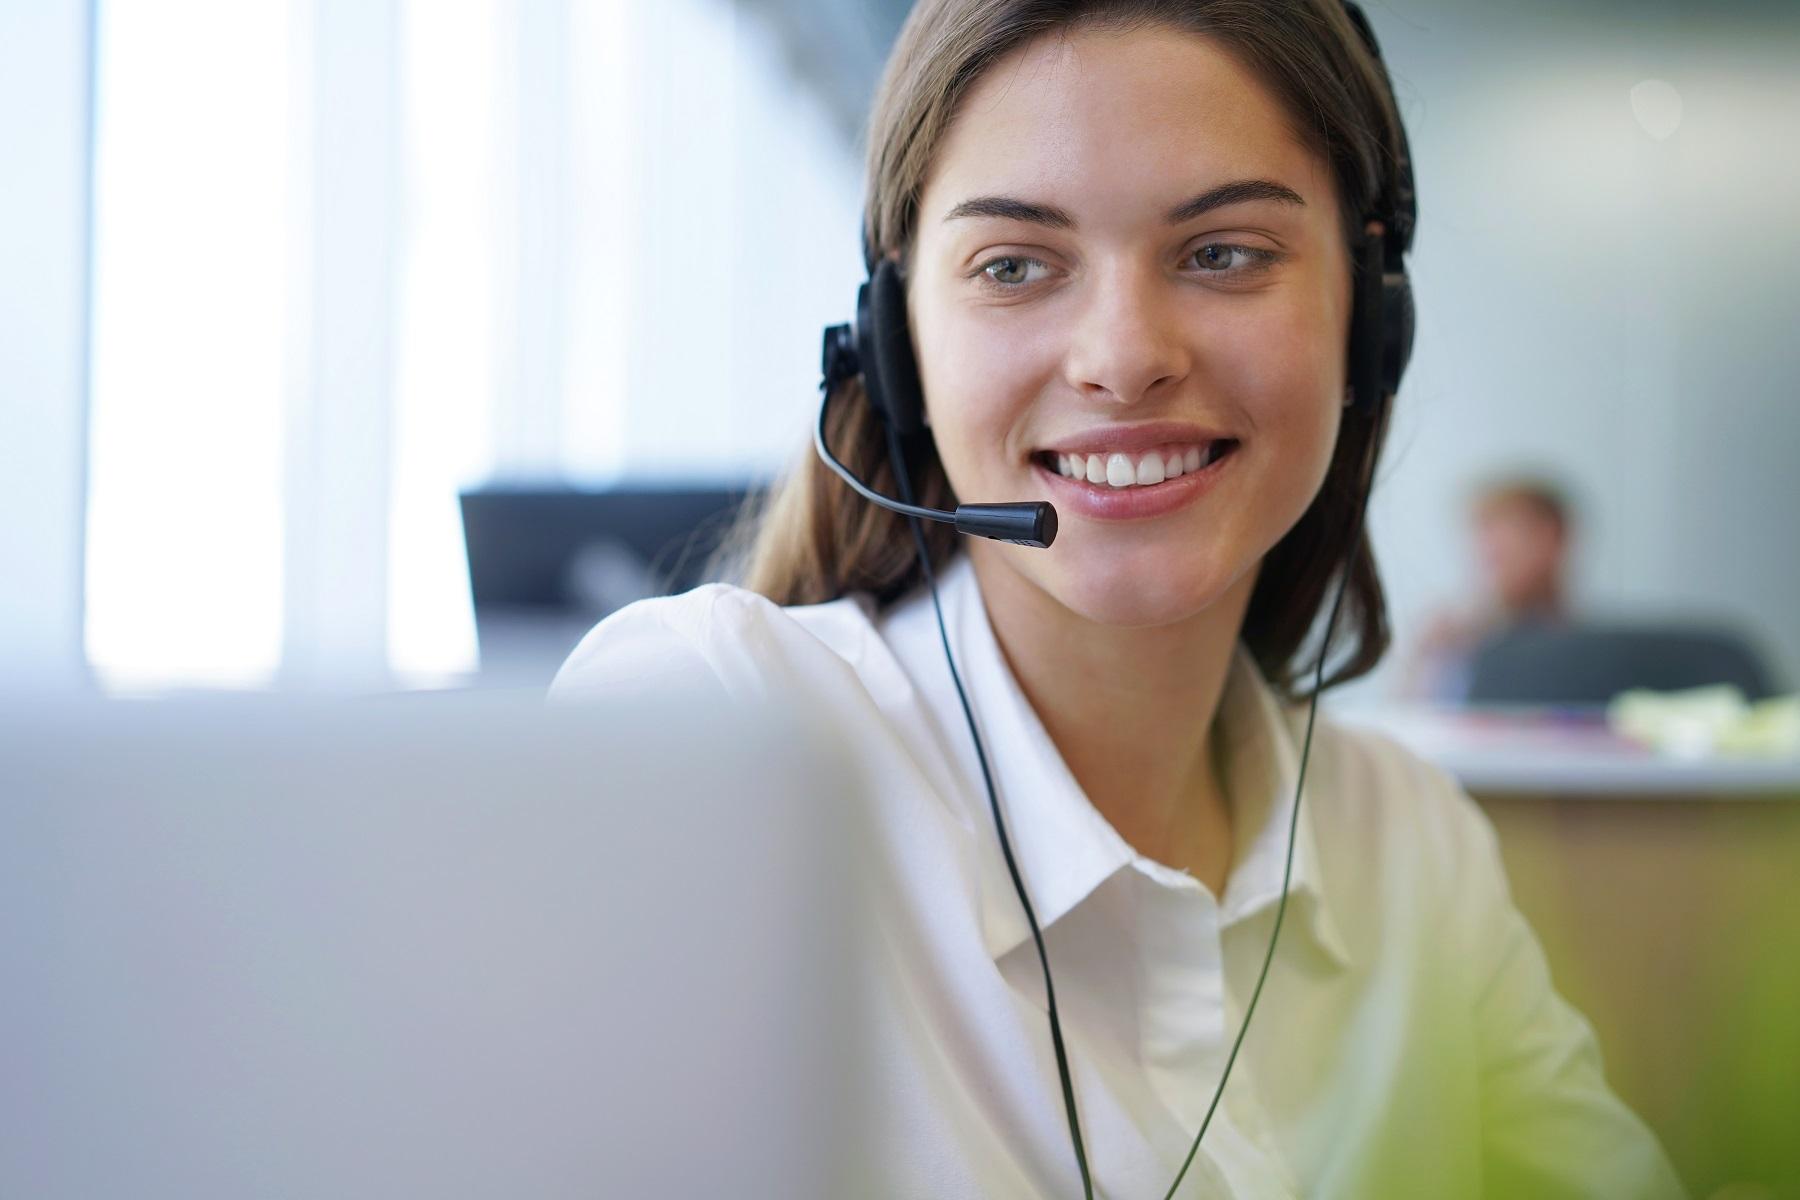 Job Sachbearbeiter im Reklamationsmanagement – Patientenservice